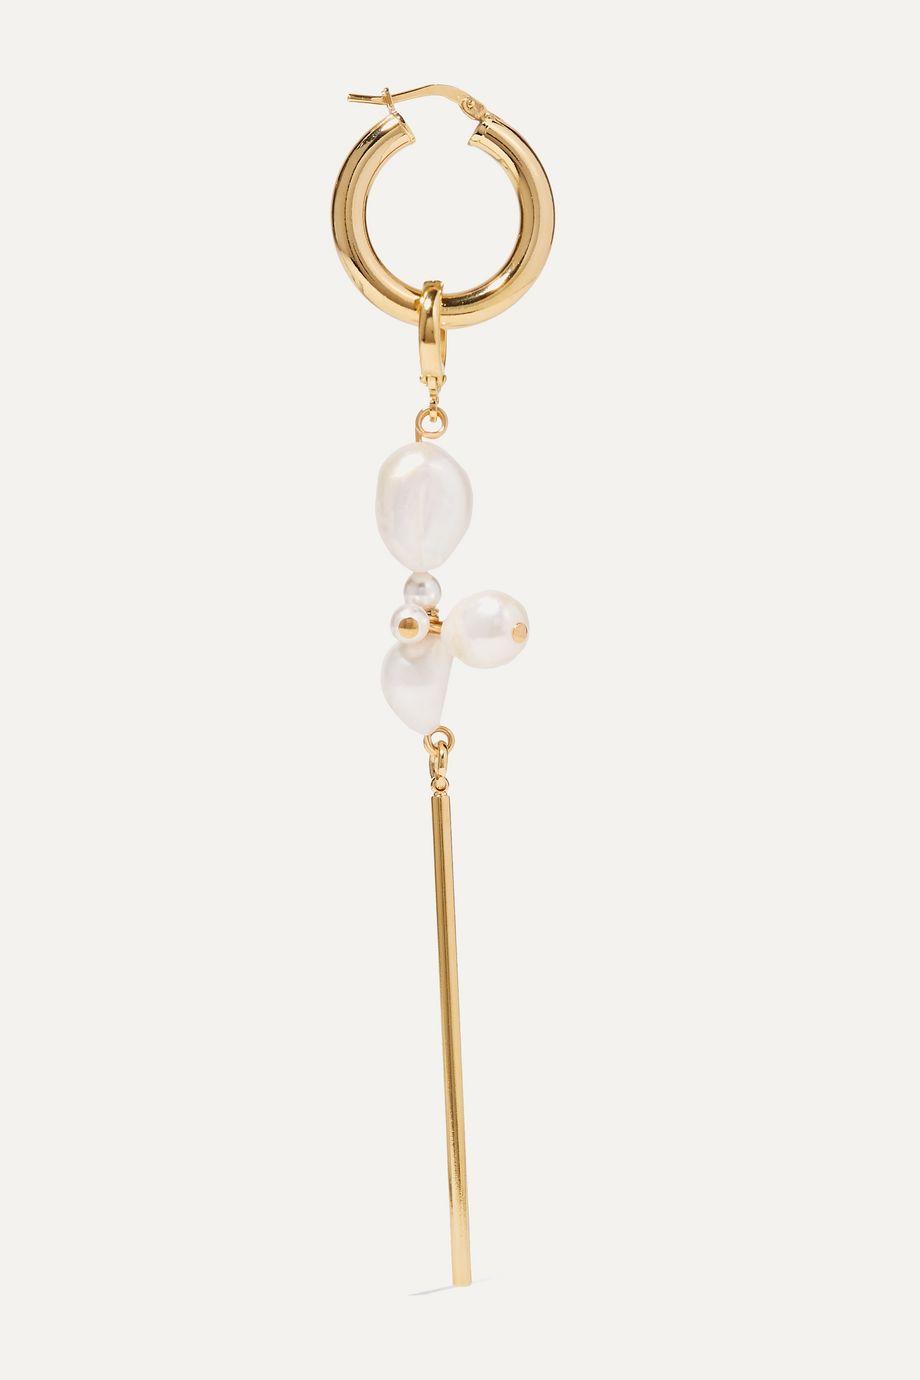 Mounser Golden Clouds vergoldete Creolen mit Perlen